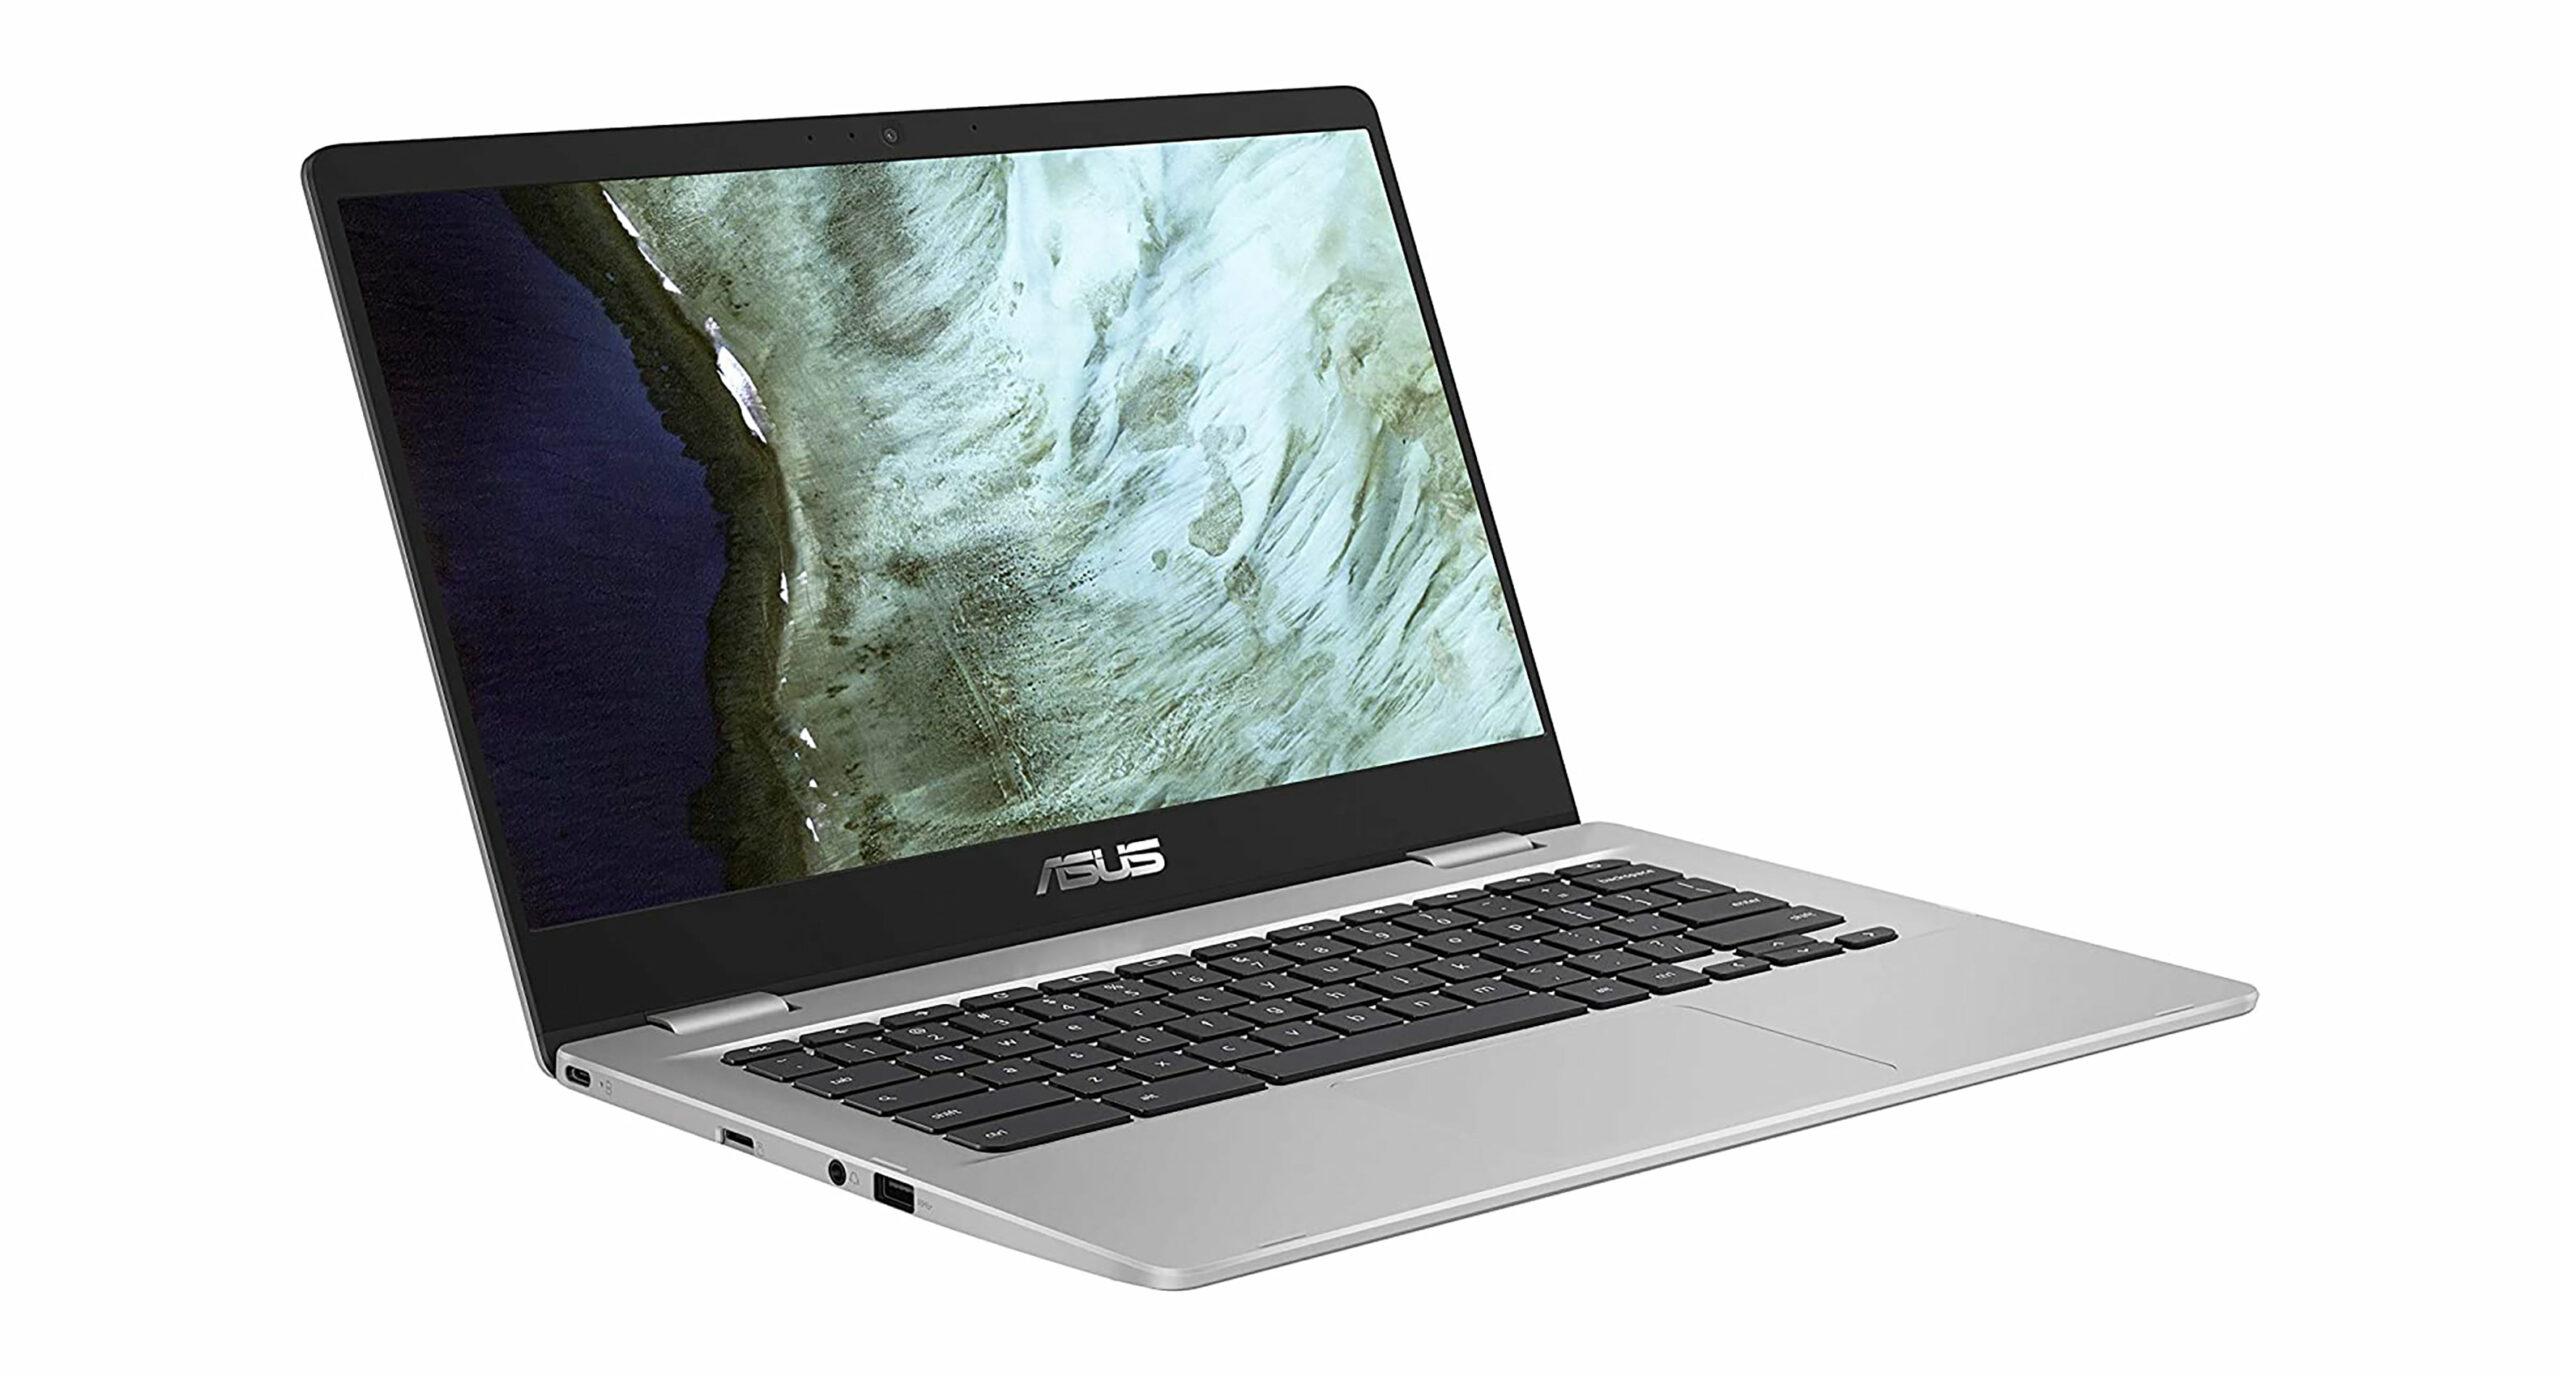 Asus Chromebook laptop